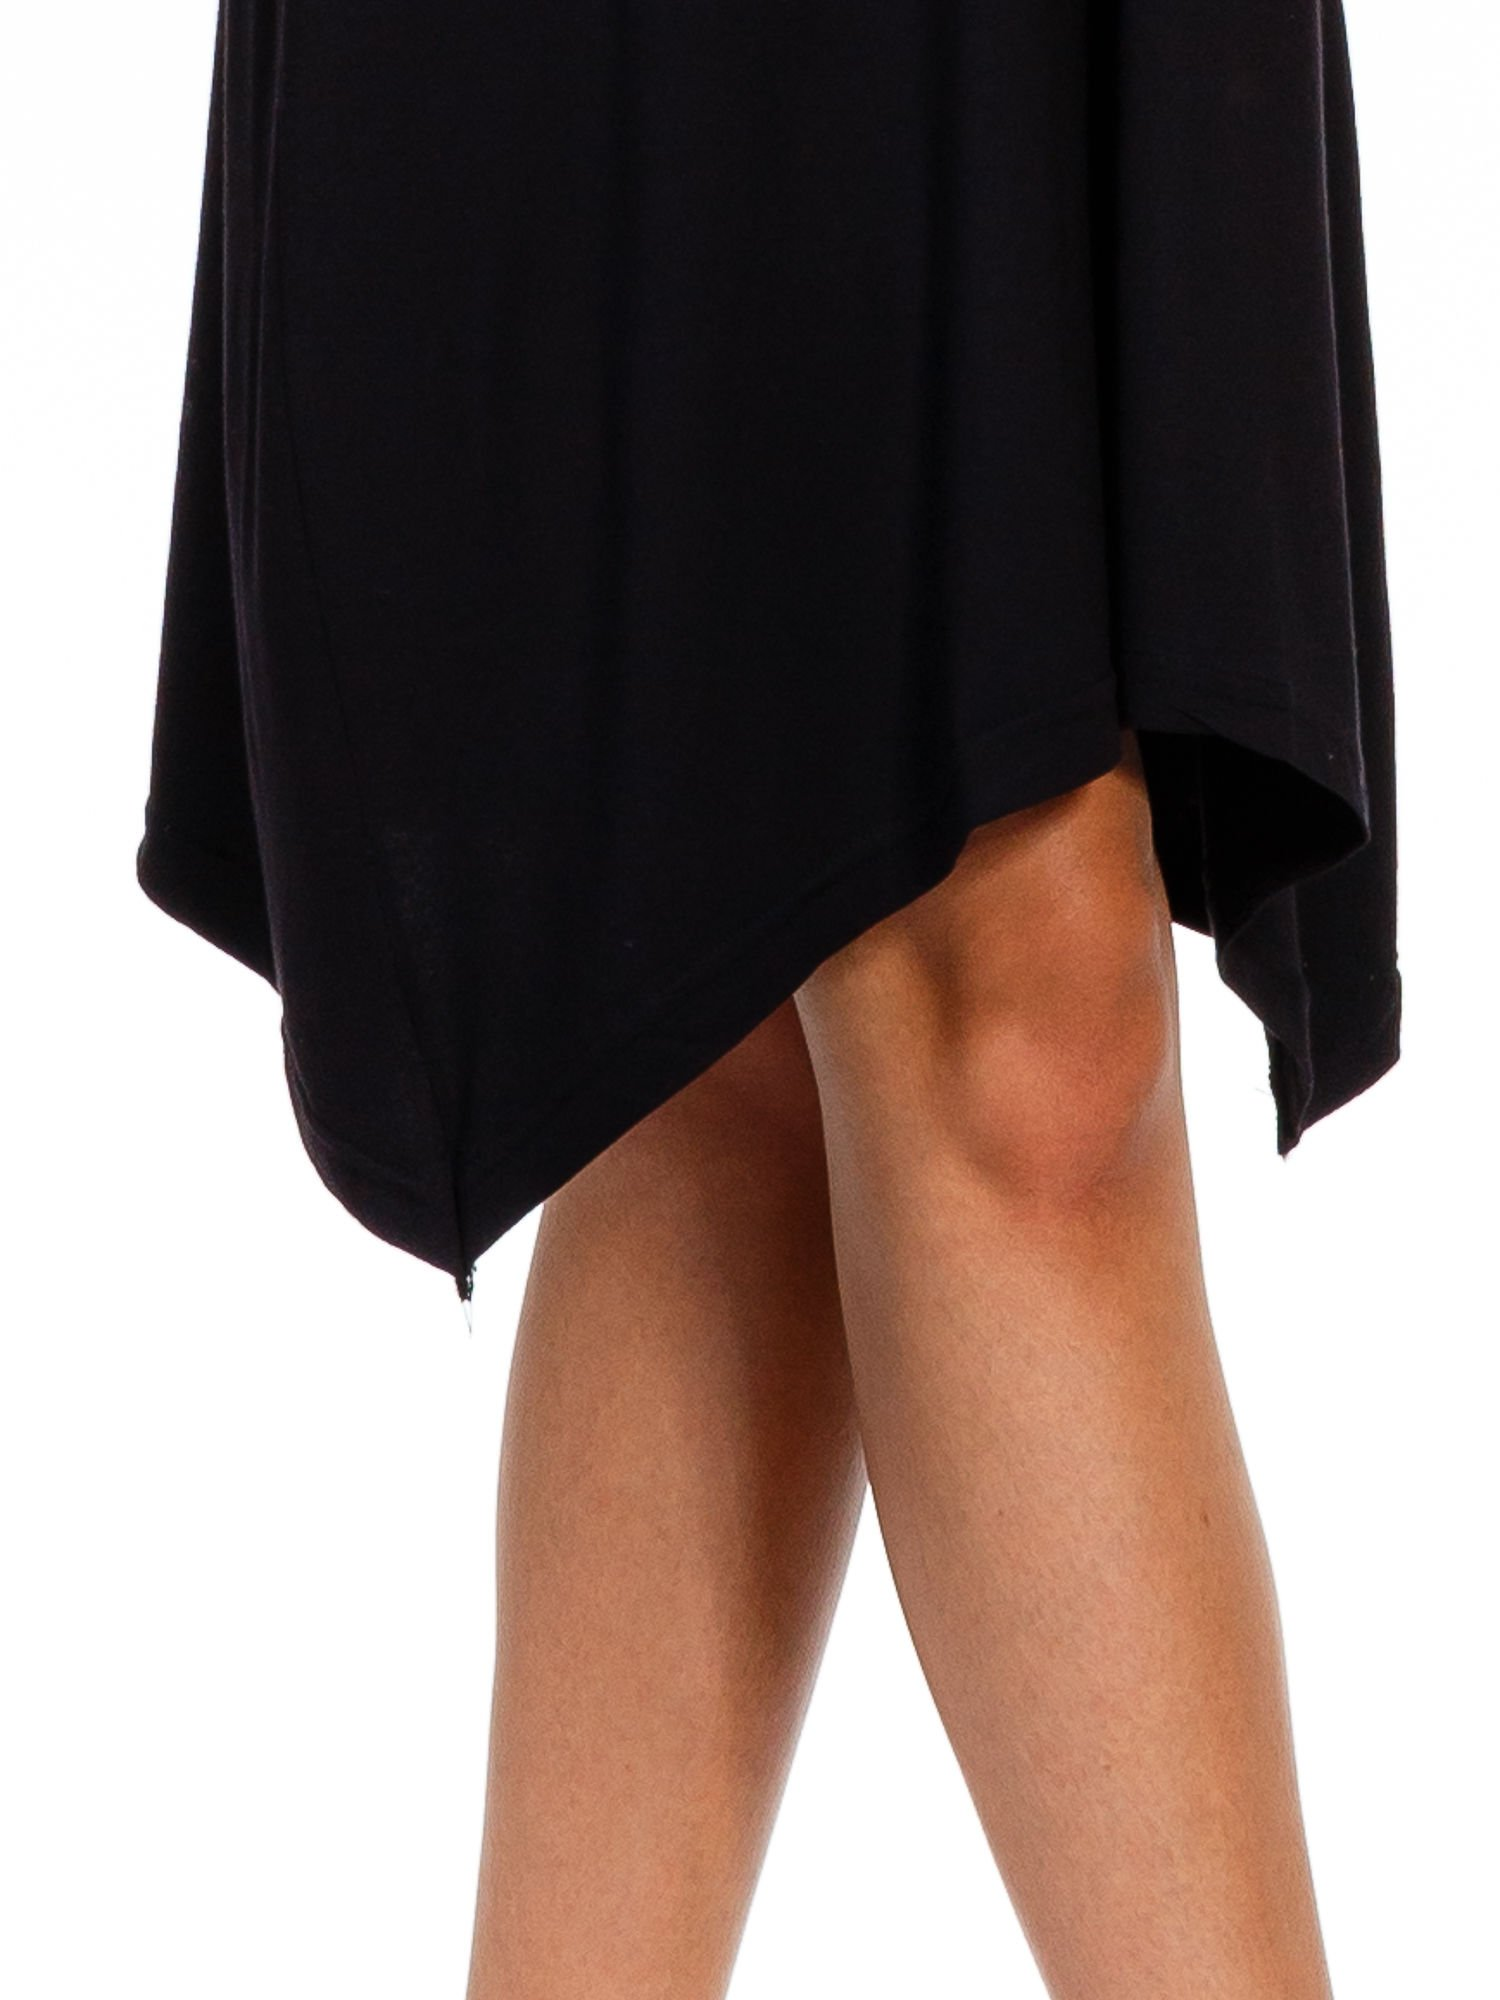 Czarna luźna sukienka z asymetrycznym dołem                                  zdj.                                  3